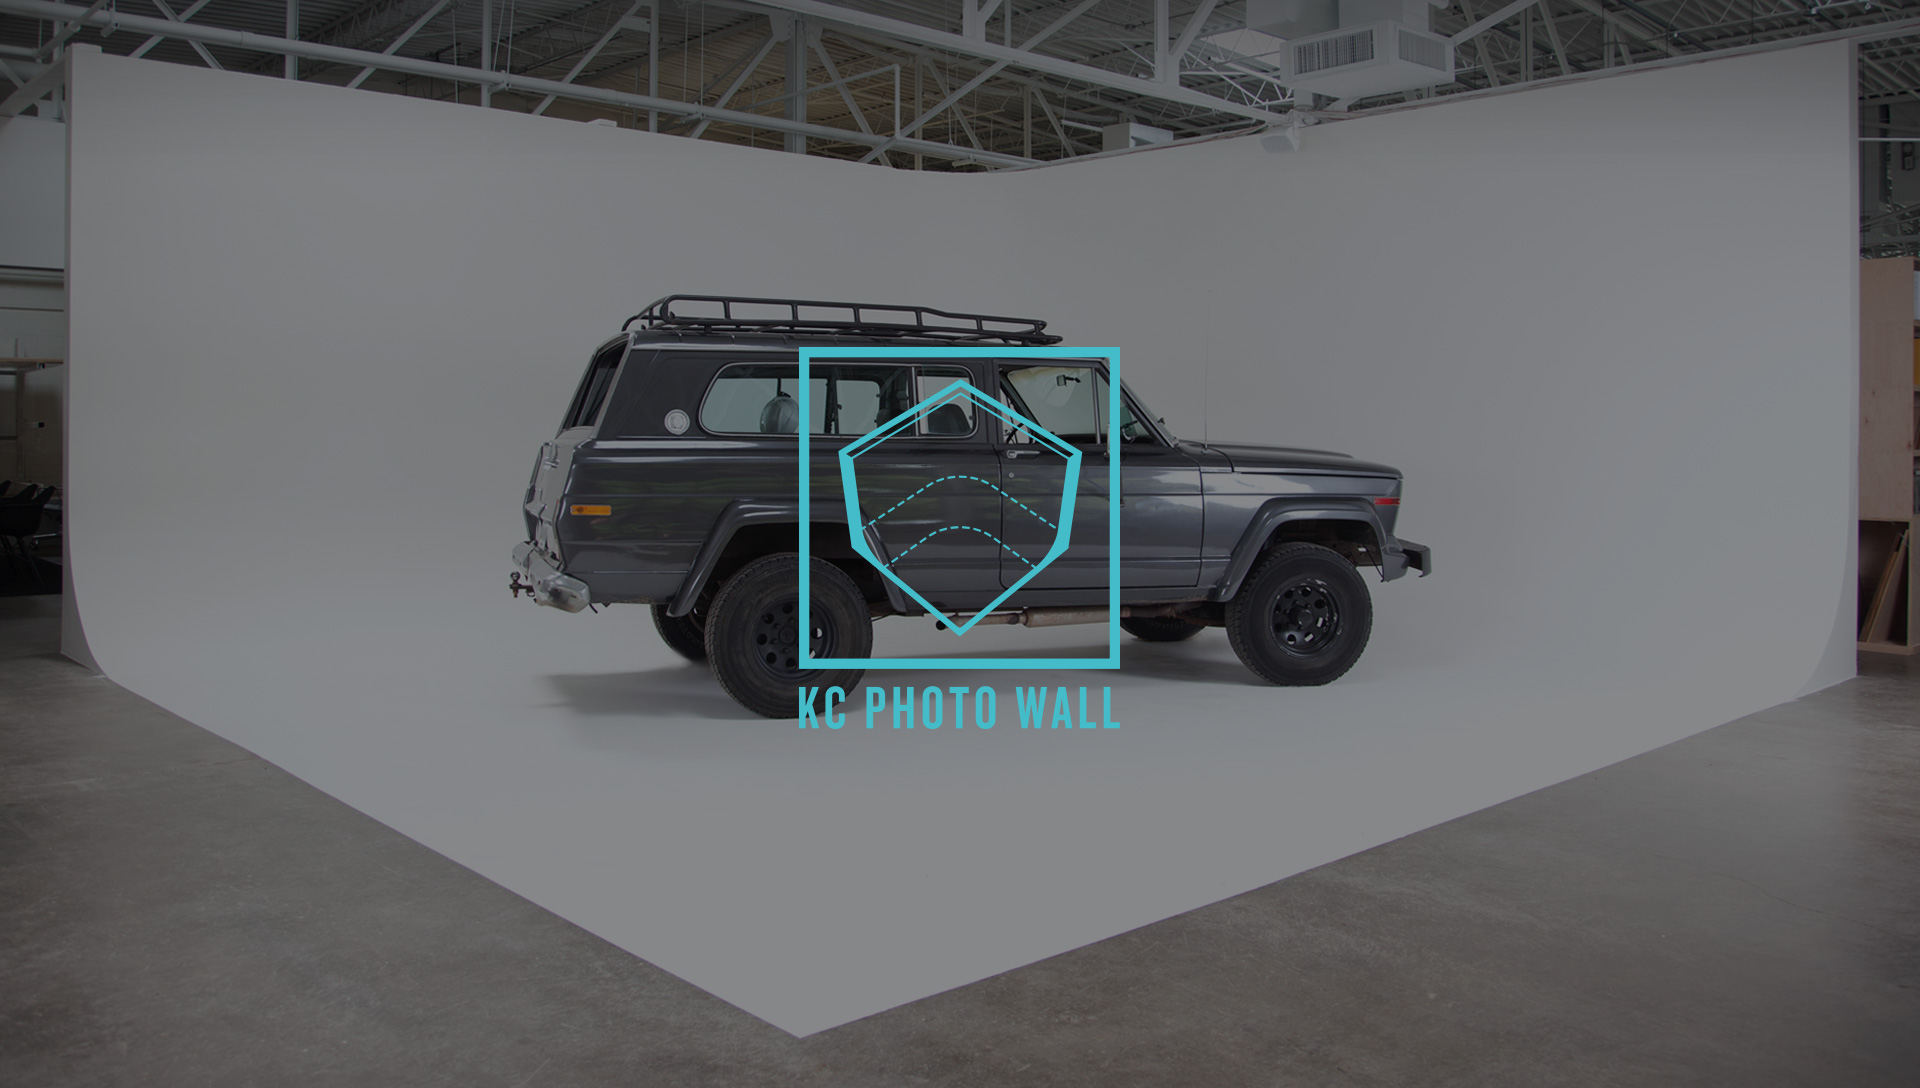 SamSmall Web-Grocers Warehouse-KC Photowall Logo Overlay